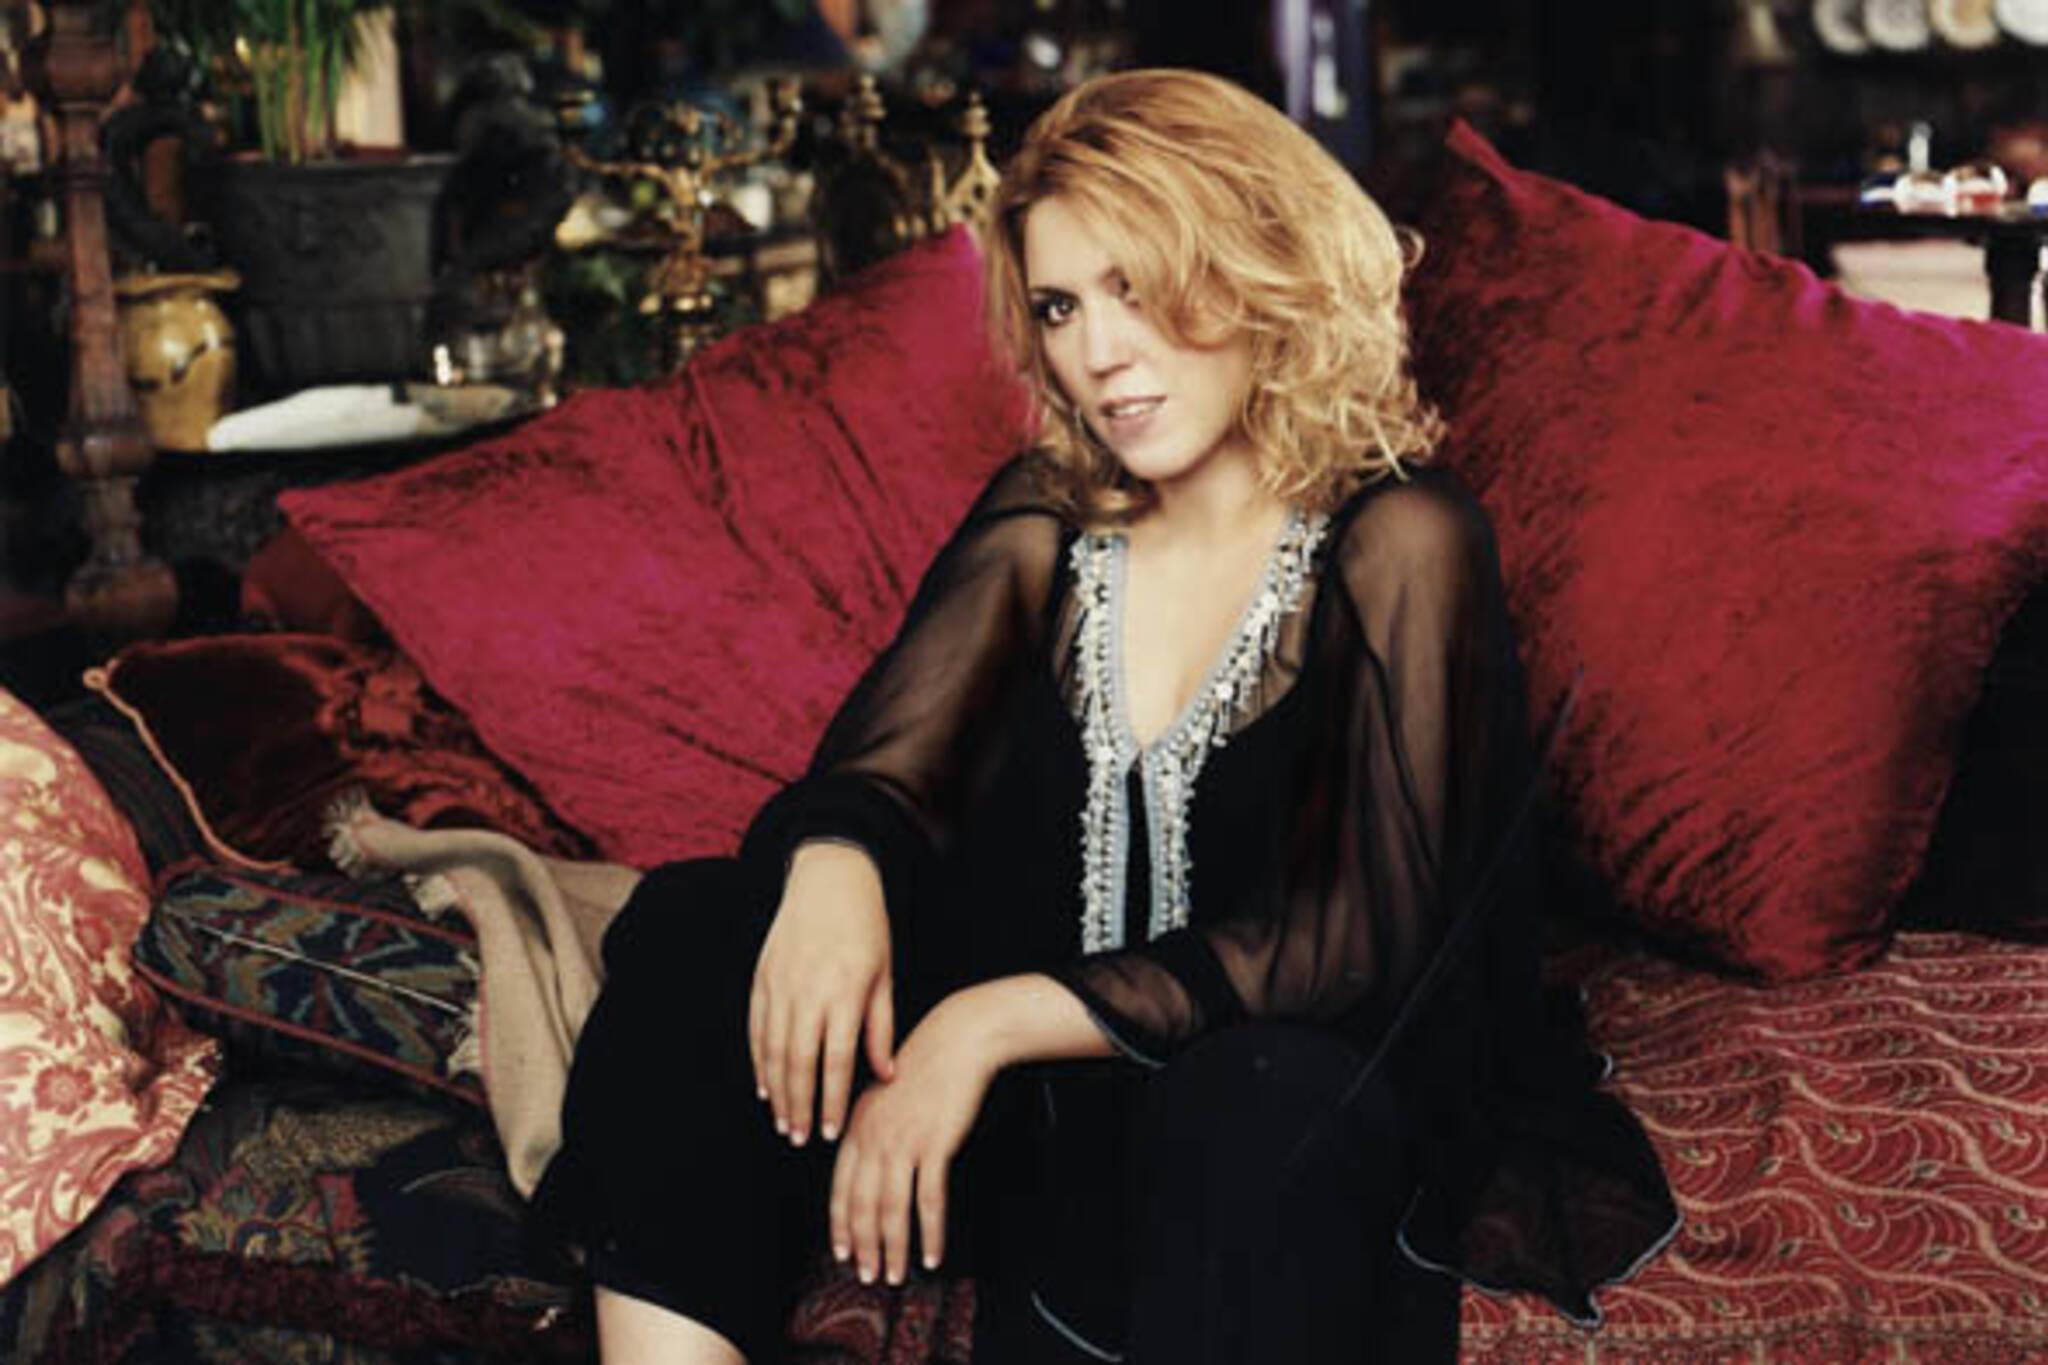 Classical pianist Gabriela Montero